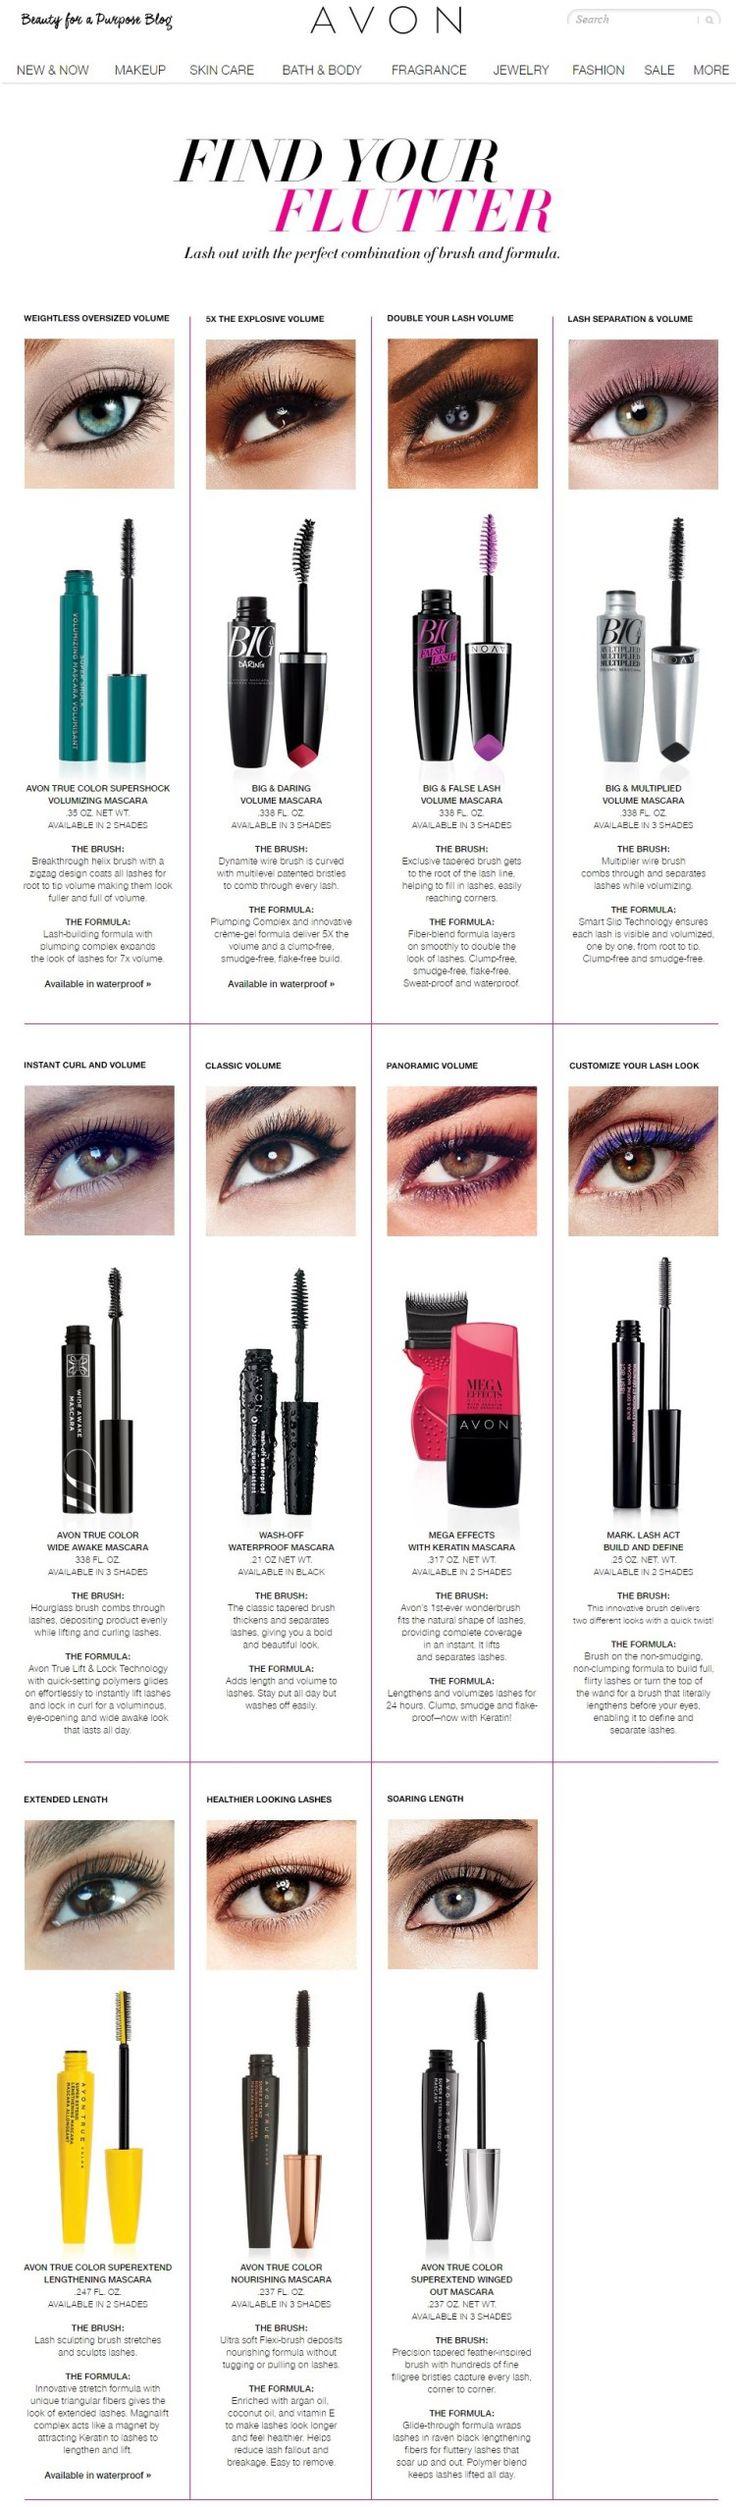 Avon Mascara Guide - Find your flutter and choose the right Avon Mascara for you.  Buy Avon Mascara at:  https://www.avon.com/category/makeup/eyes/mascara?rep=barbieb #mascara #avon #perfect #makeup #avonrep #beautywithbarb #barbieb_beauty #avonmakeup